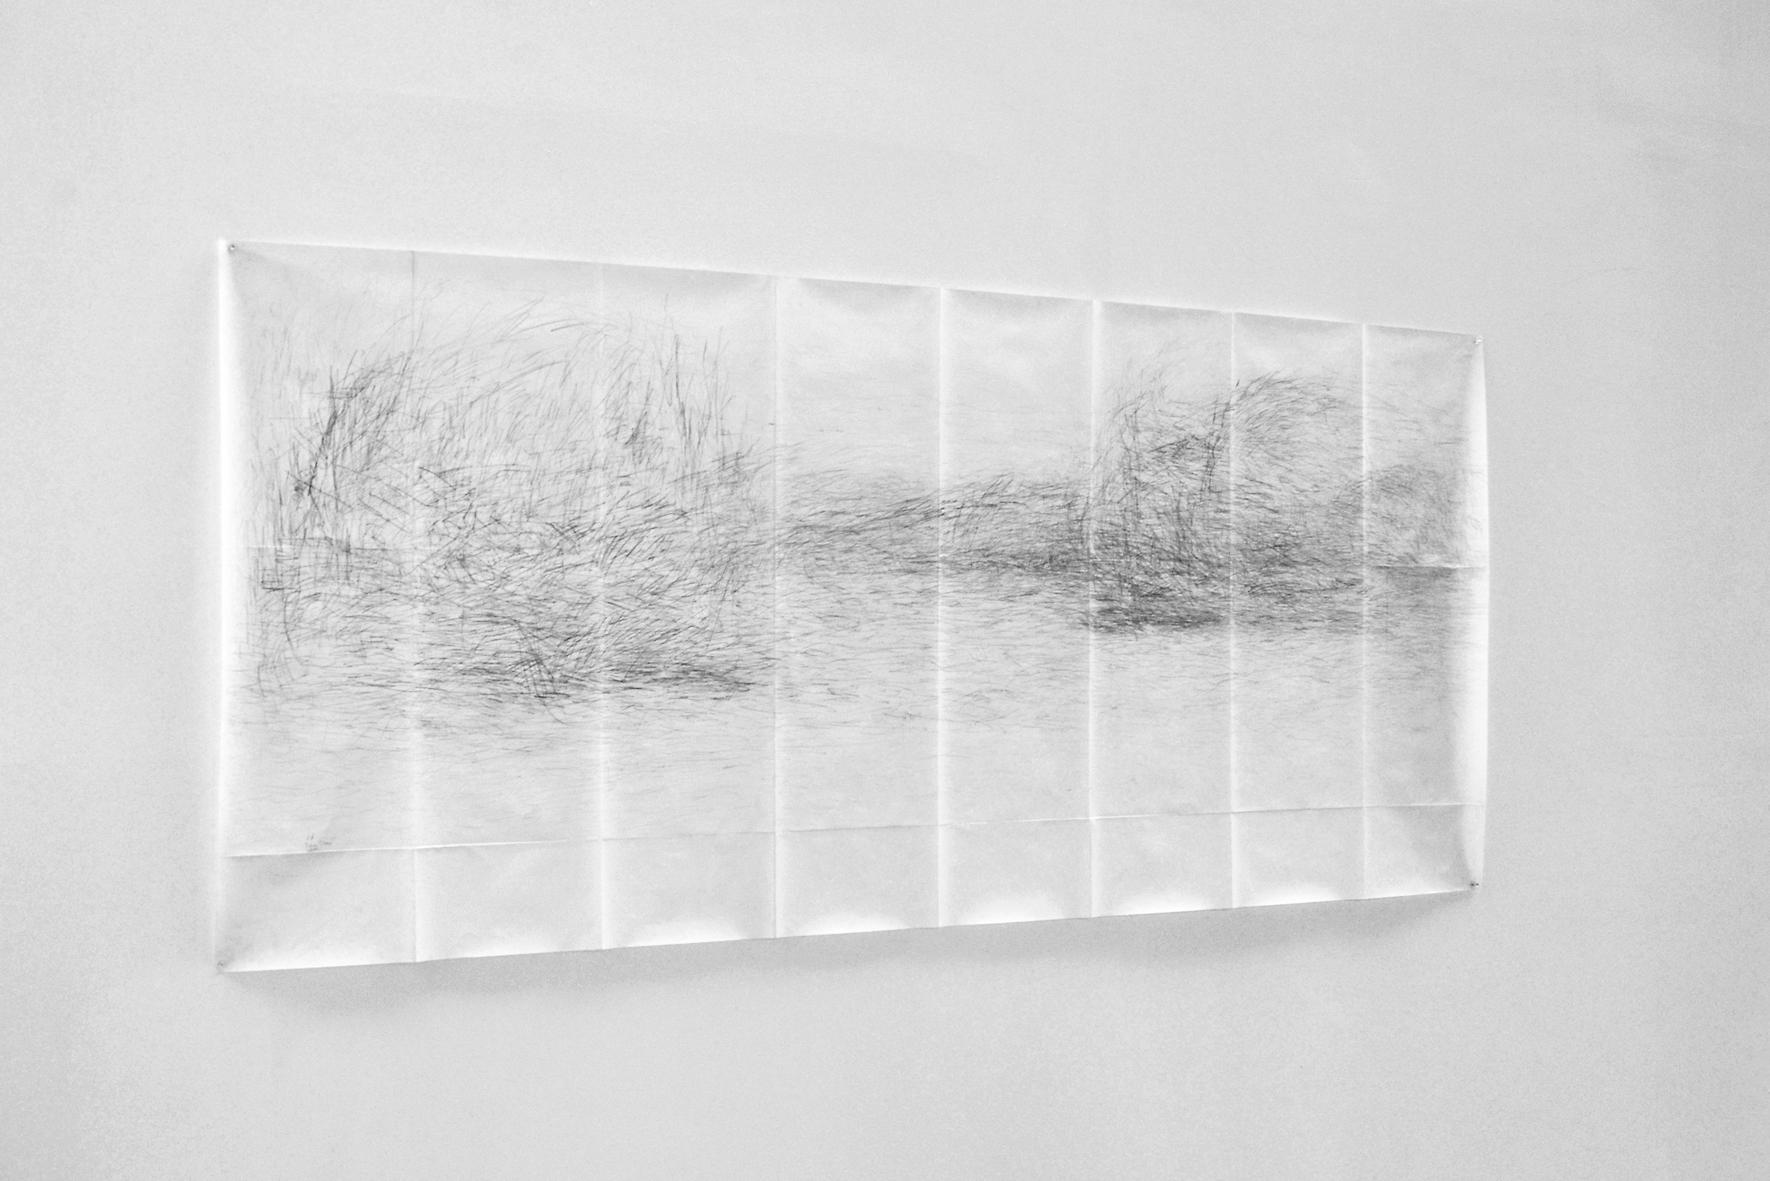 UNTITLED (Byam Shaw) (2011/2017) pencil on paper, 100 x 215 cm, unfolded, Image copyright: Olivia Mihălțianu